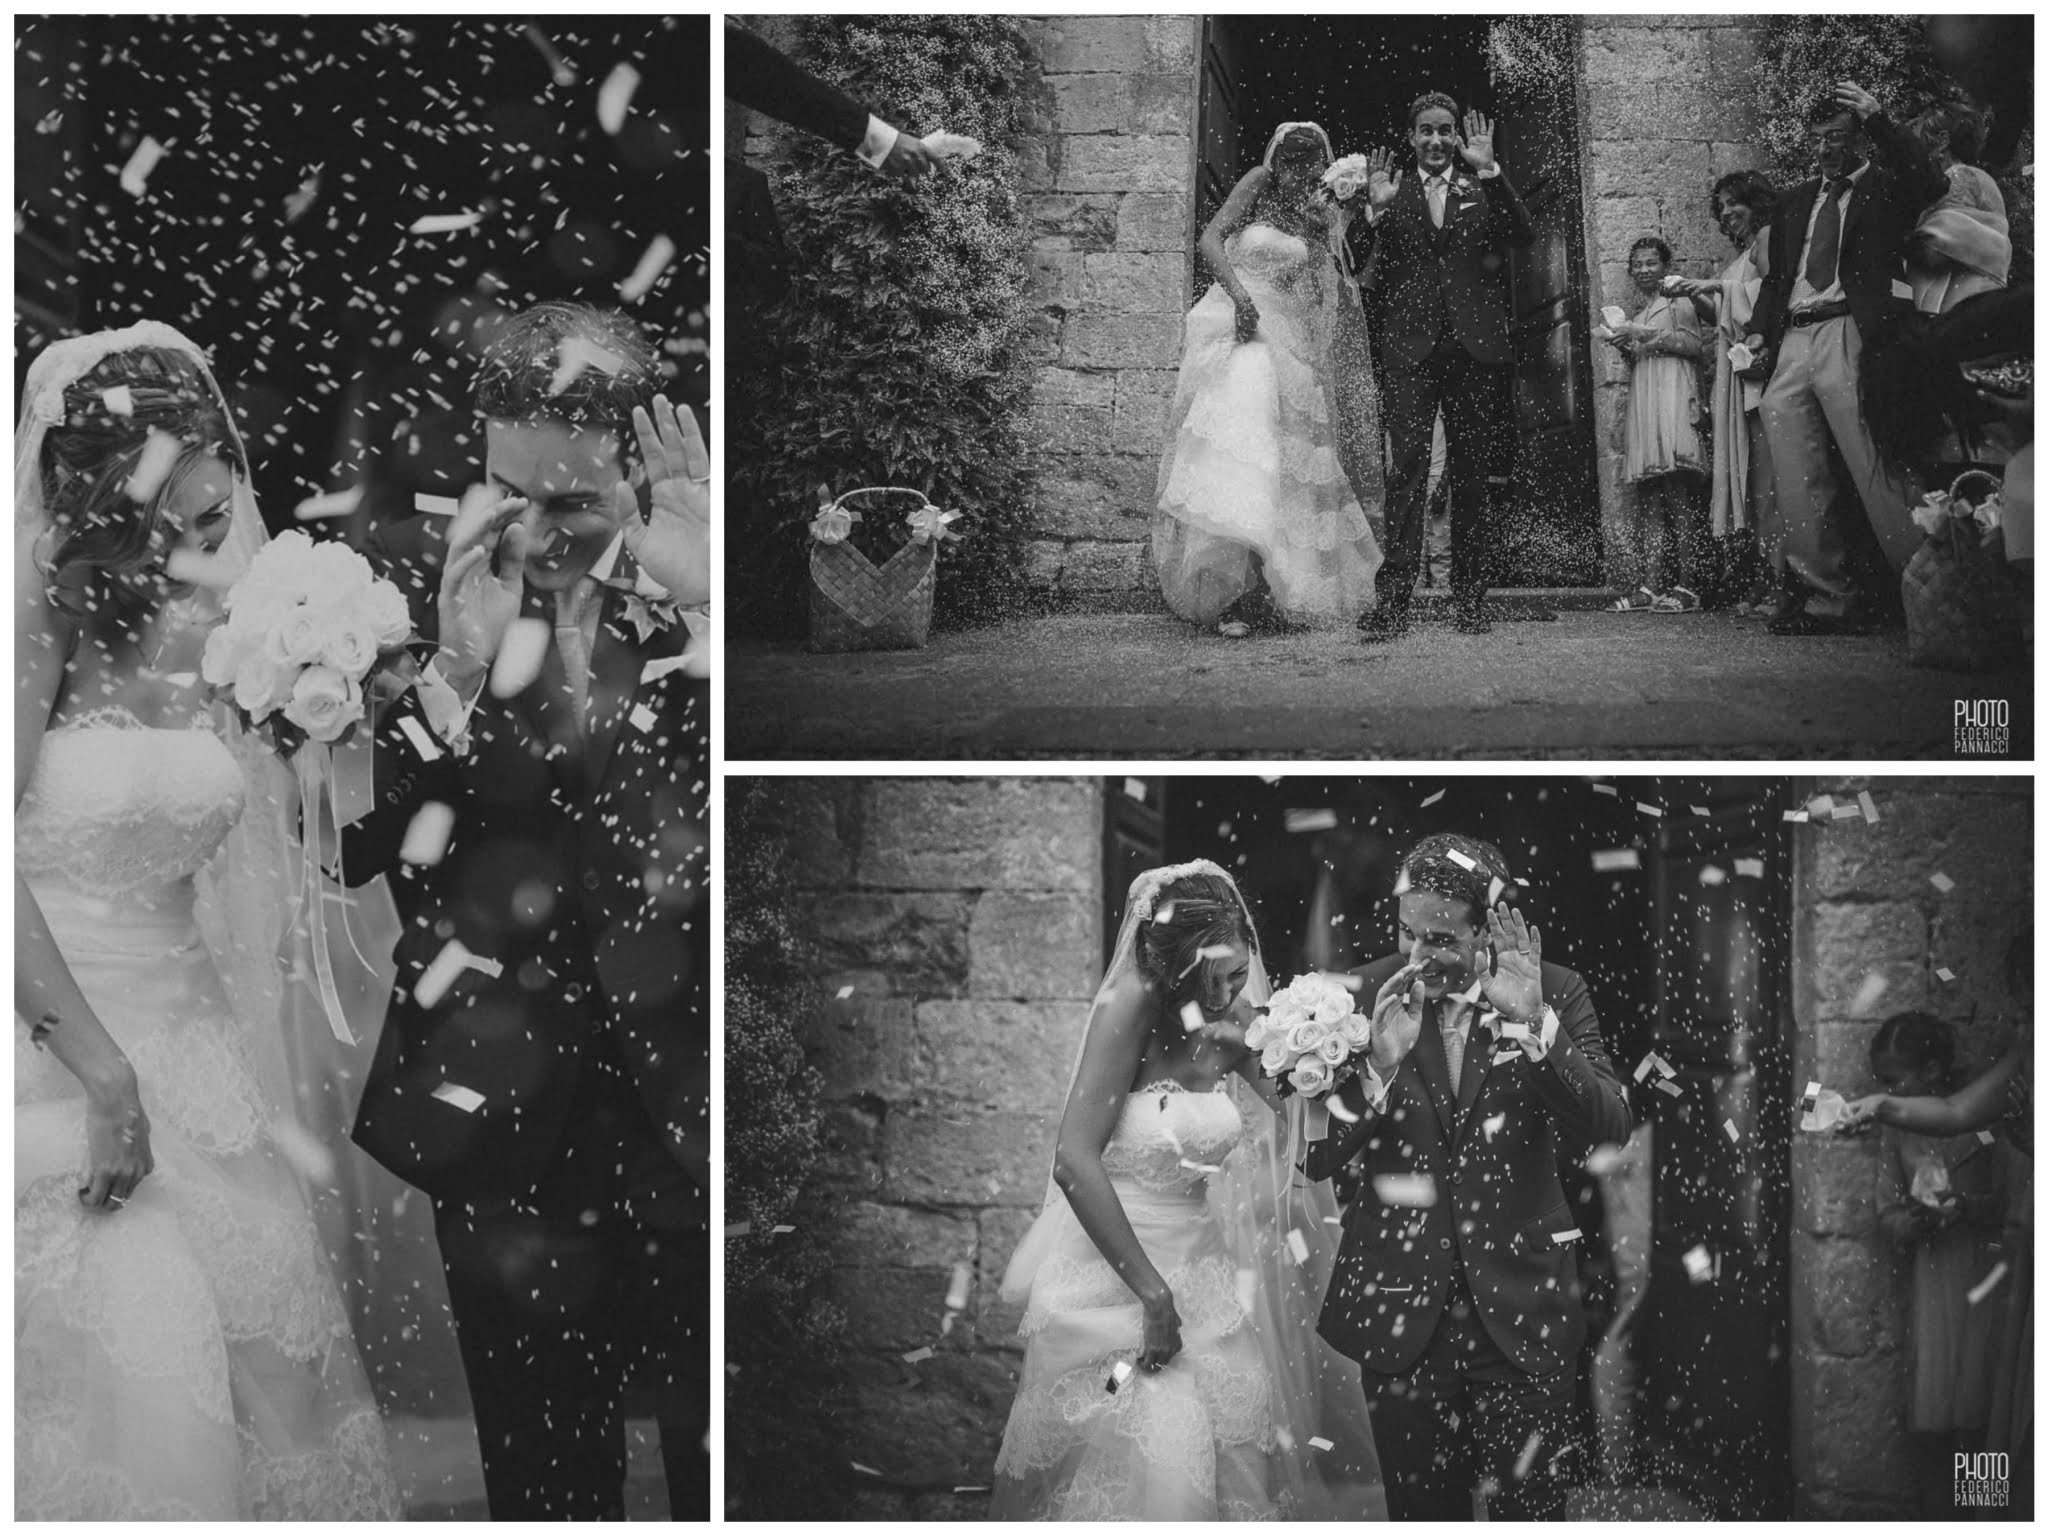 fotografo matrimonio siena-68_Fotor_Collage